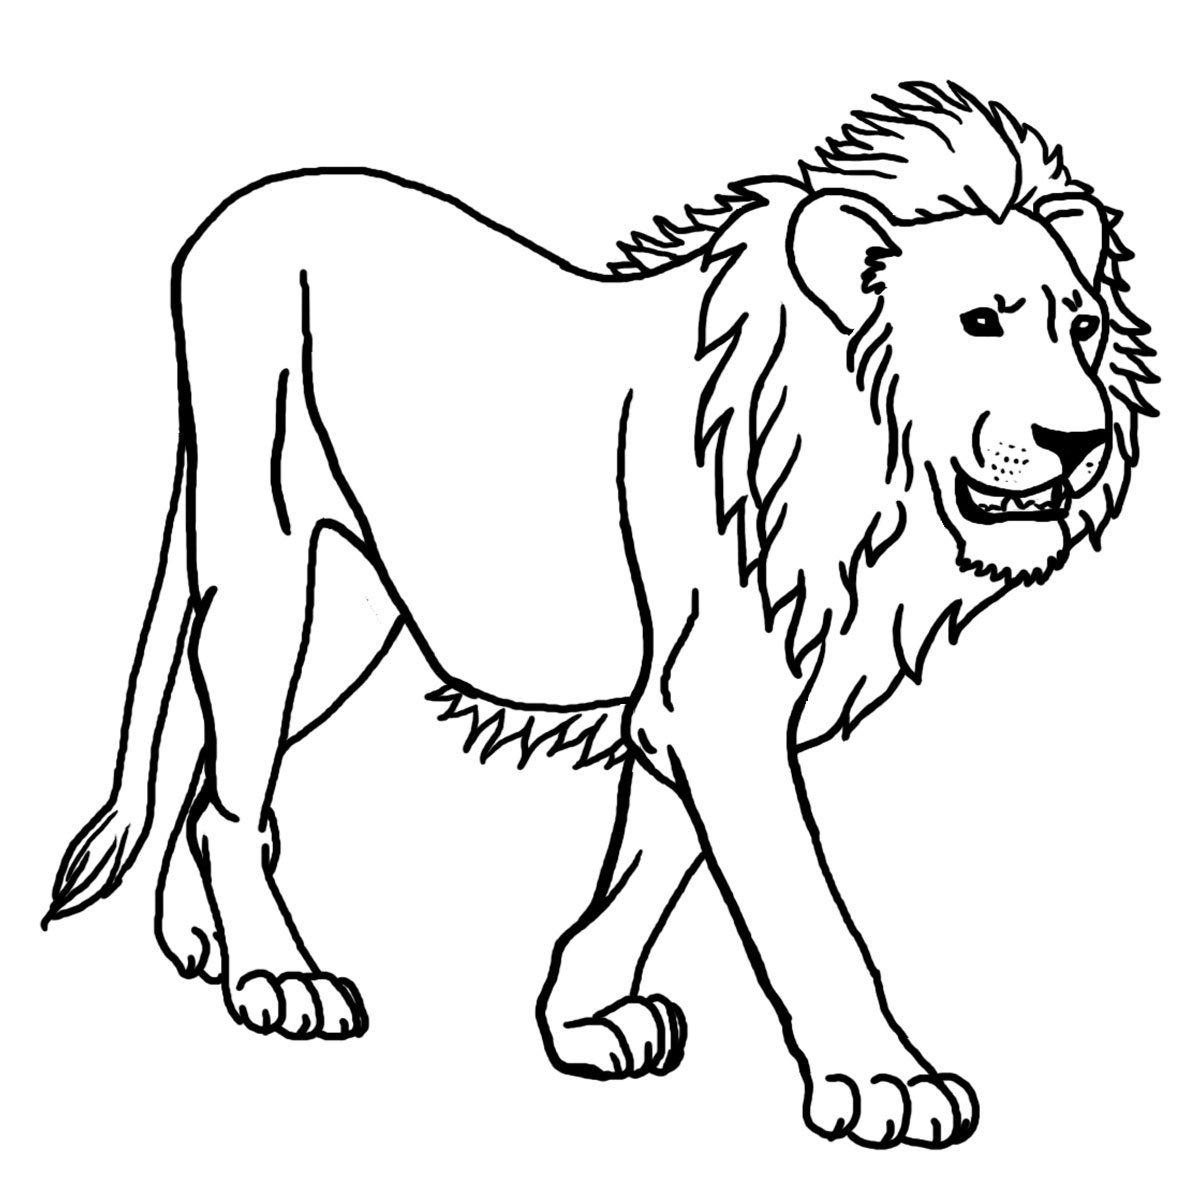 León salvaje para pintar para colorear